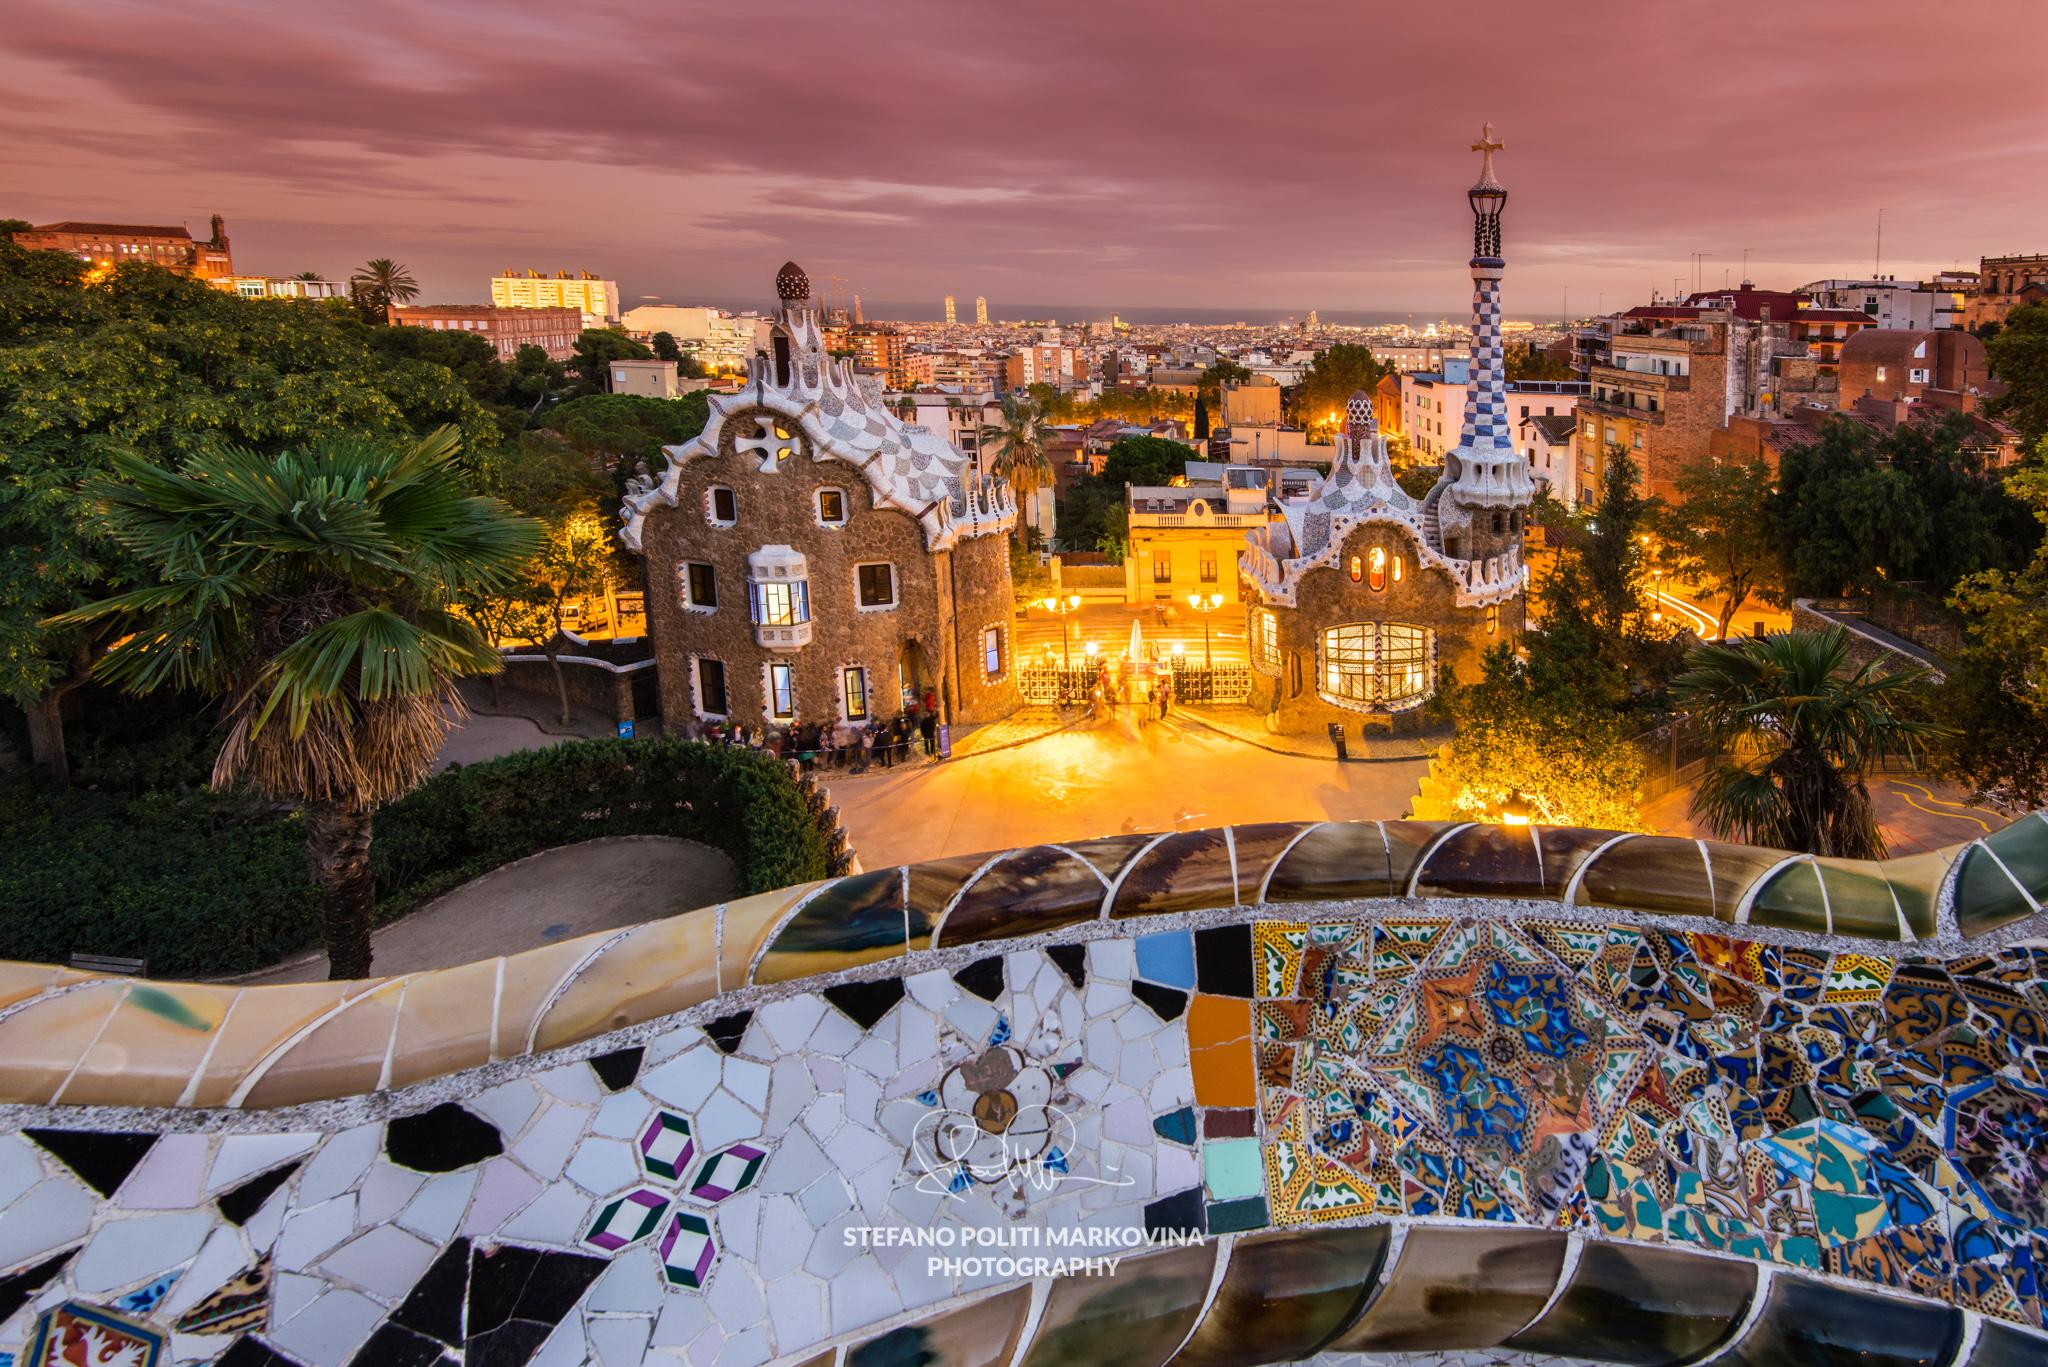 Park Guell, Barcelona, Catalonia, Spain